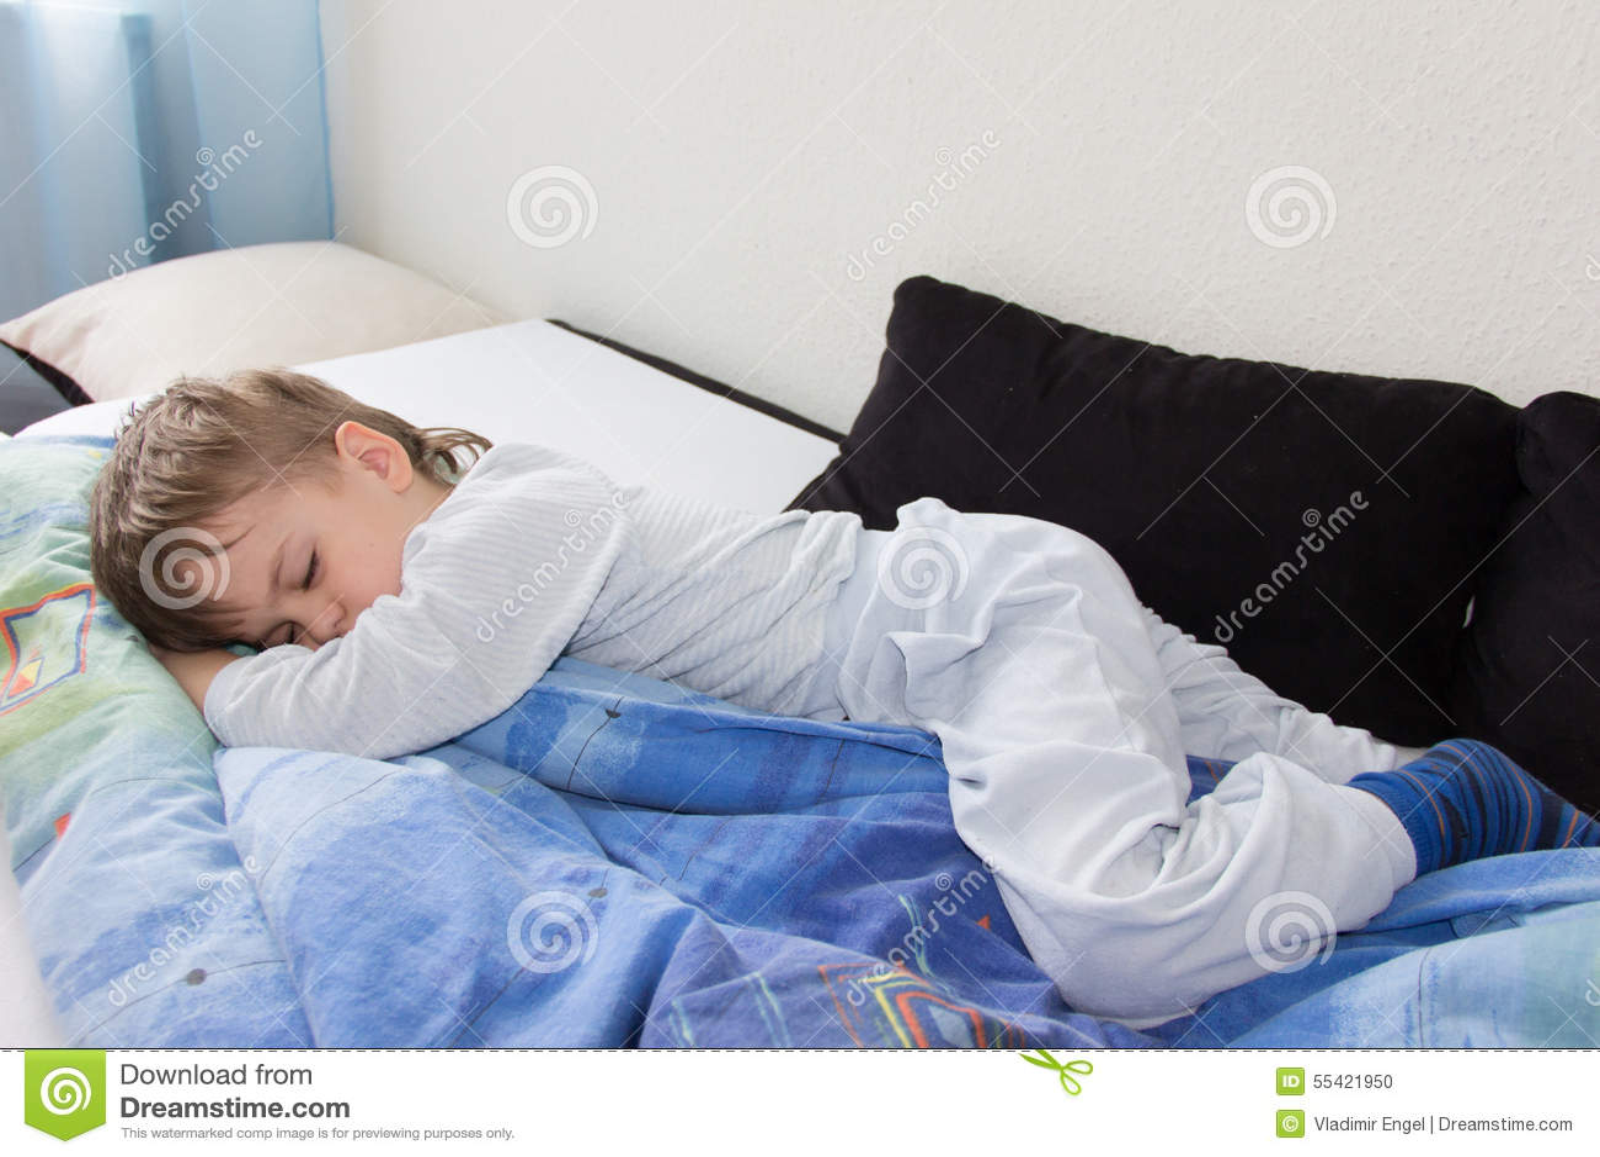 Sleeping Boy Son Relax Dreaming Child Stock Photo